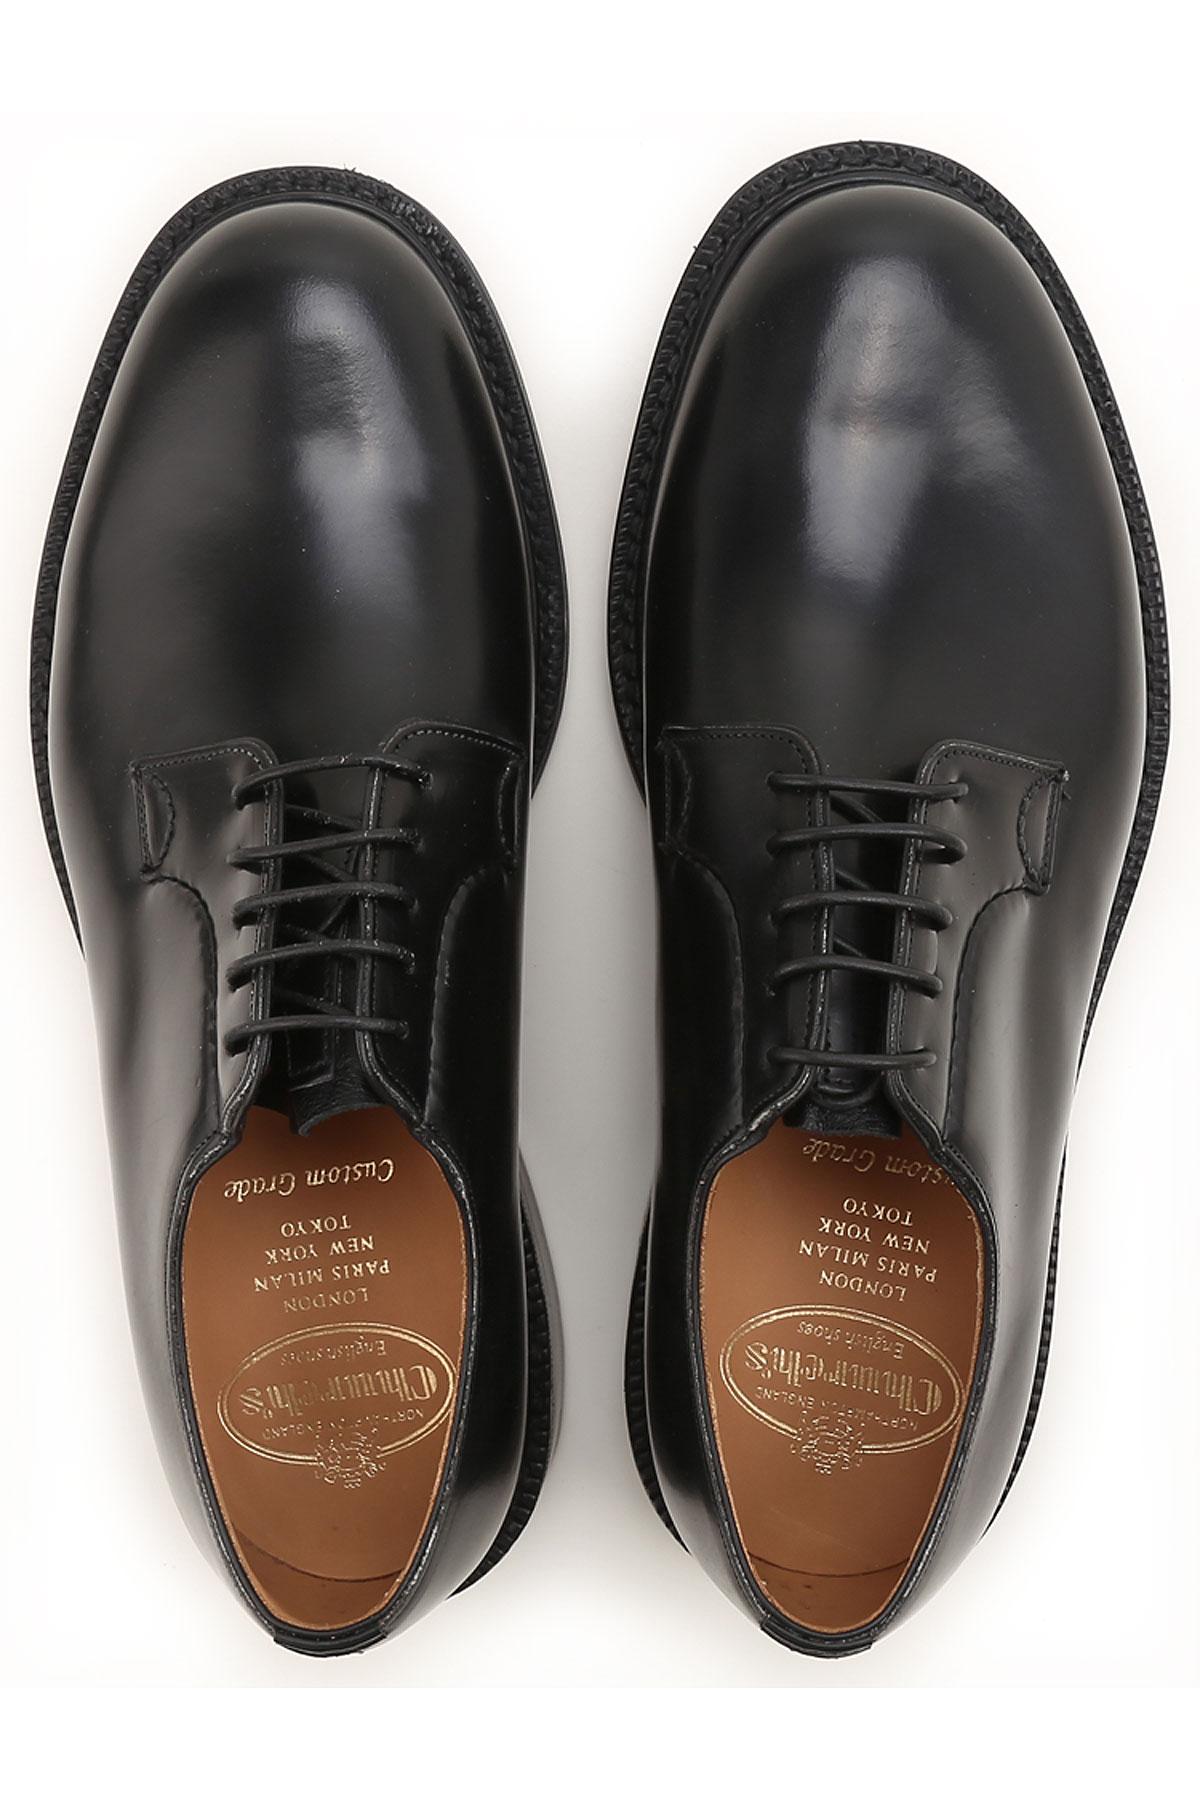 2019 Para Hombres verano Church's nbsp; Zapatos Primavera Negro wF8OxXq